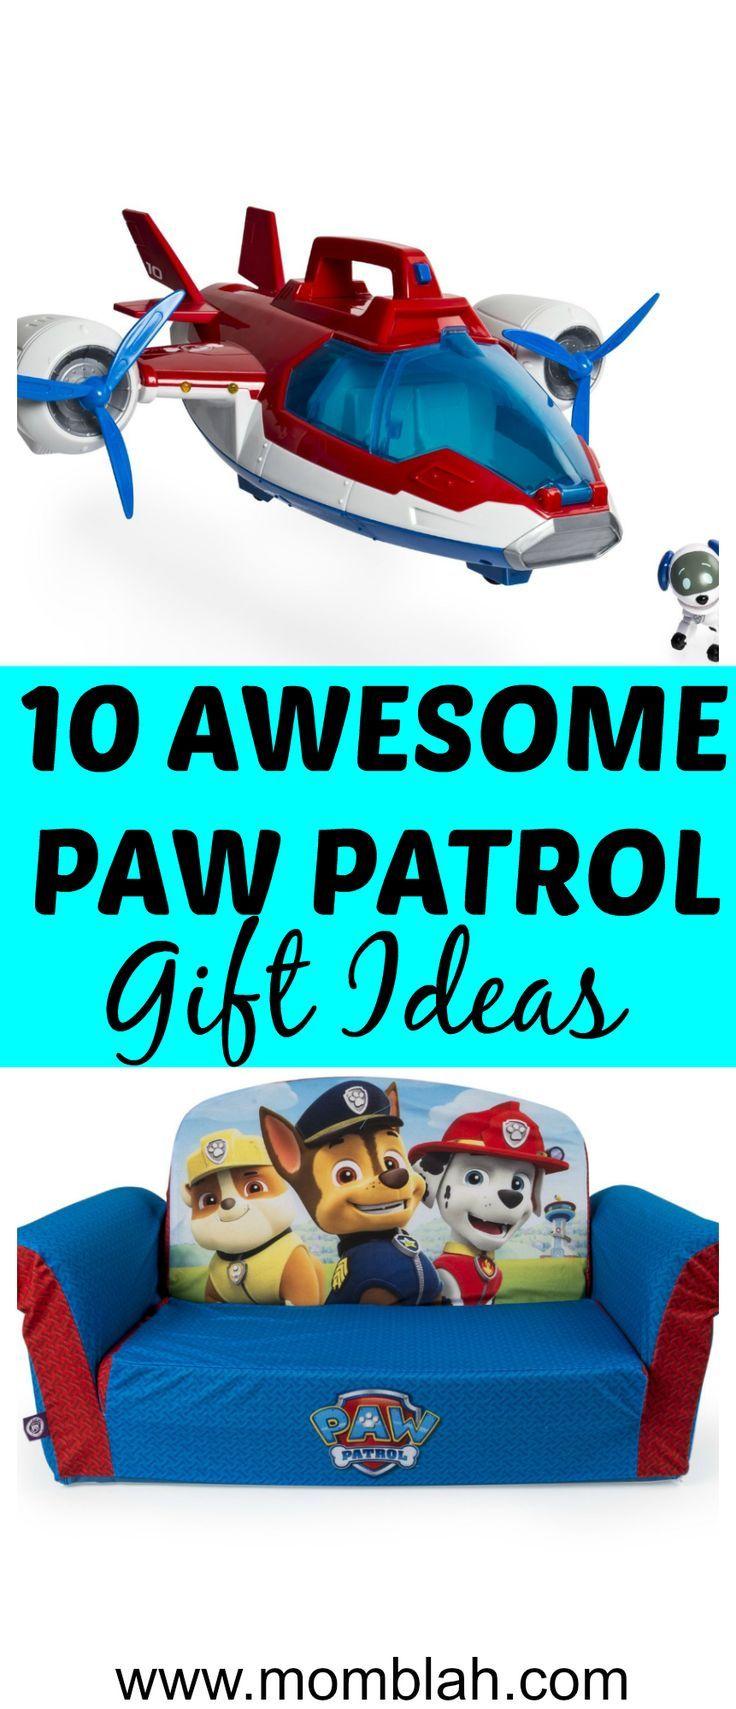 www.momblah.com Awesome Paw Patrol Gift Ideas guaranteed to please your toddler or preschooler! motherhood, momhacks, gift ideas, preschoolers, paw patrol